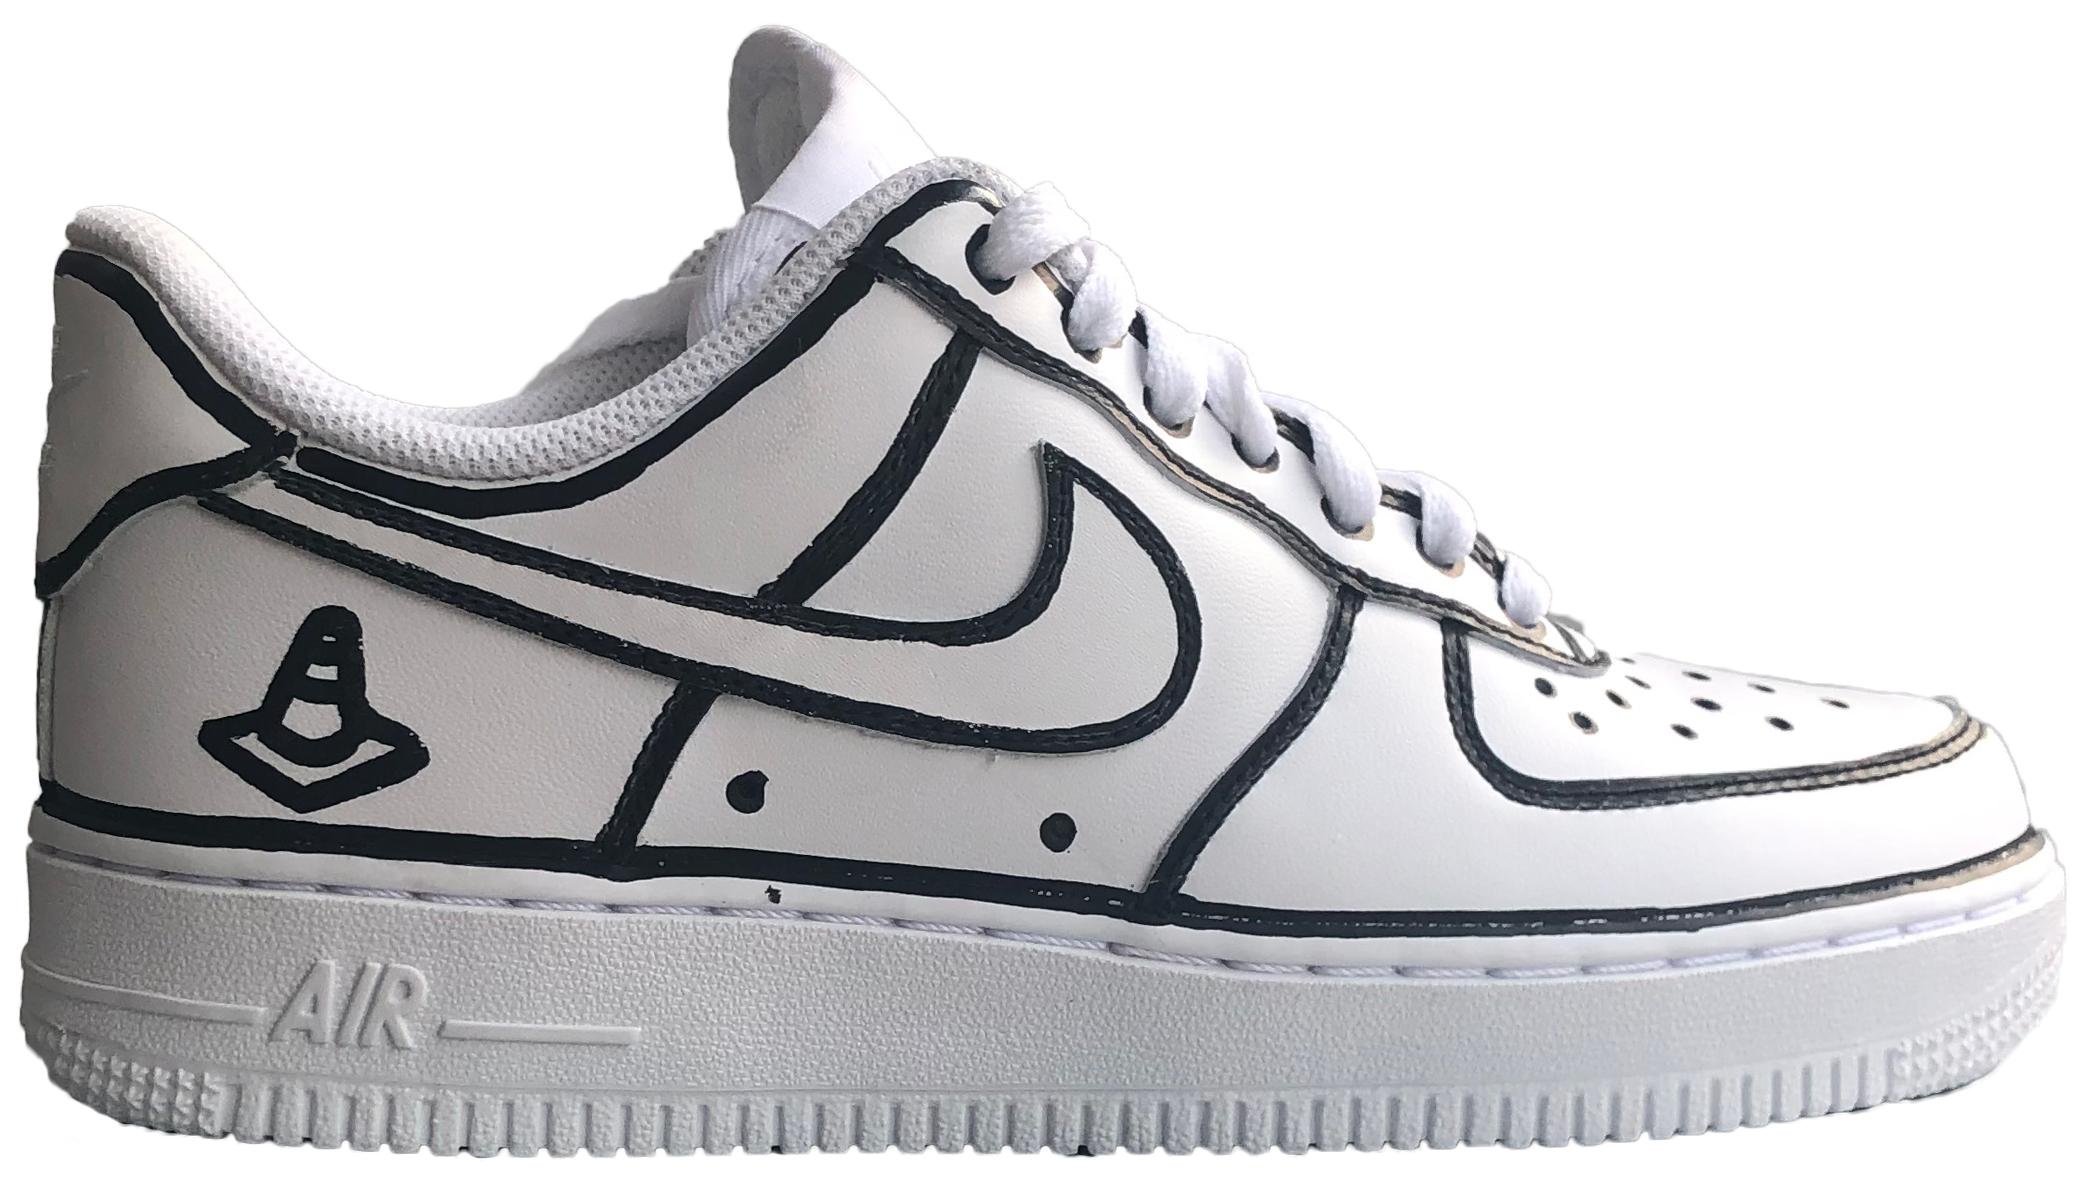 Nike Air Force 1 '07 Joshua Vides (W